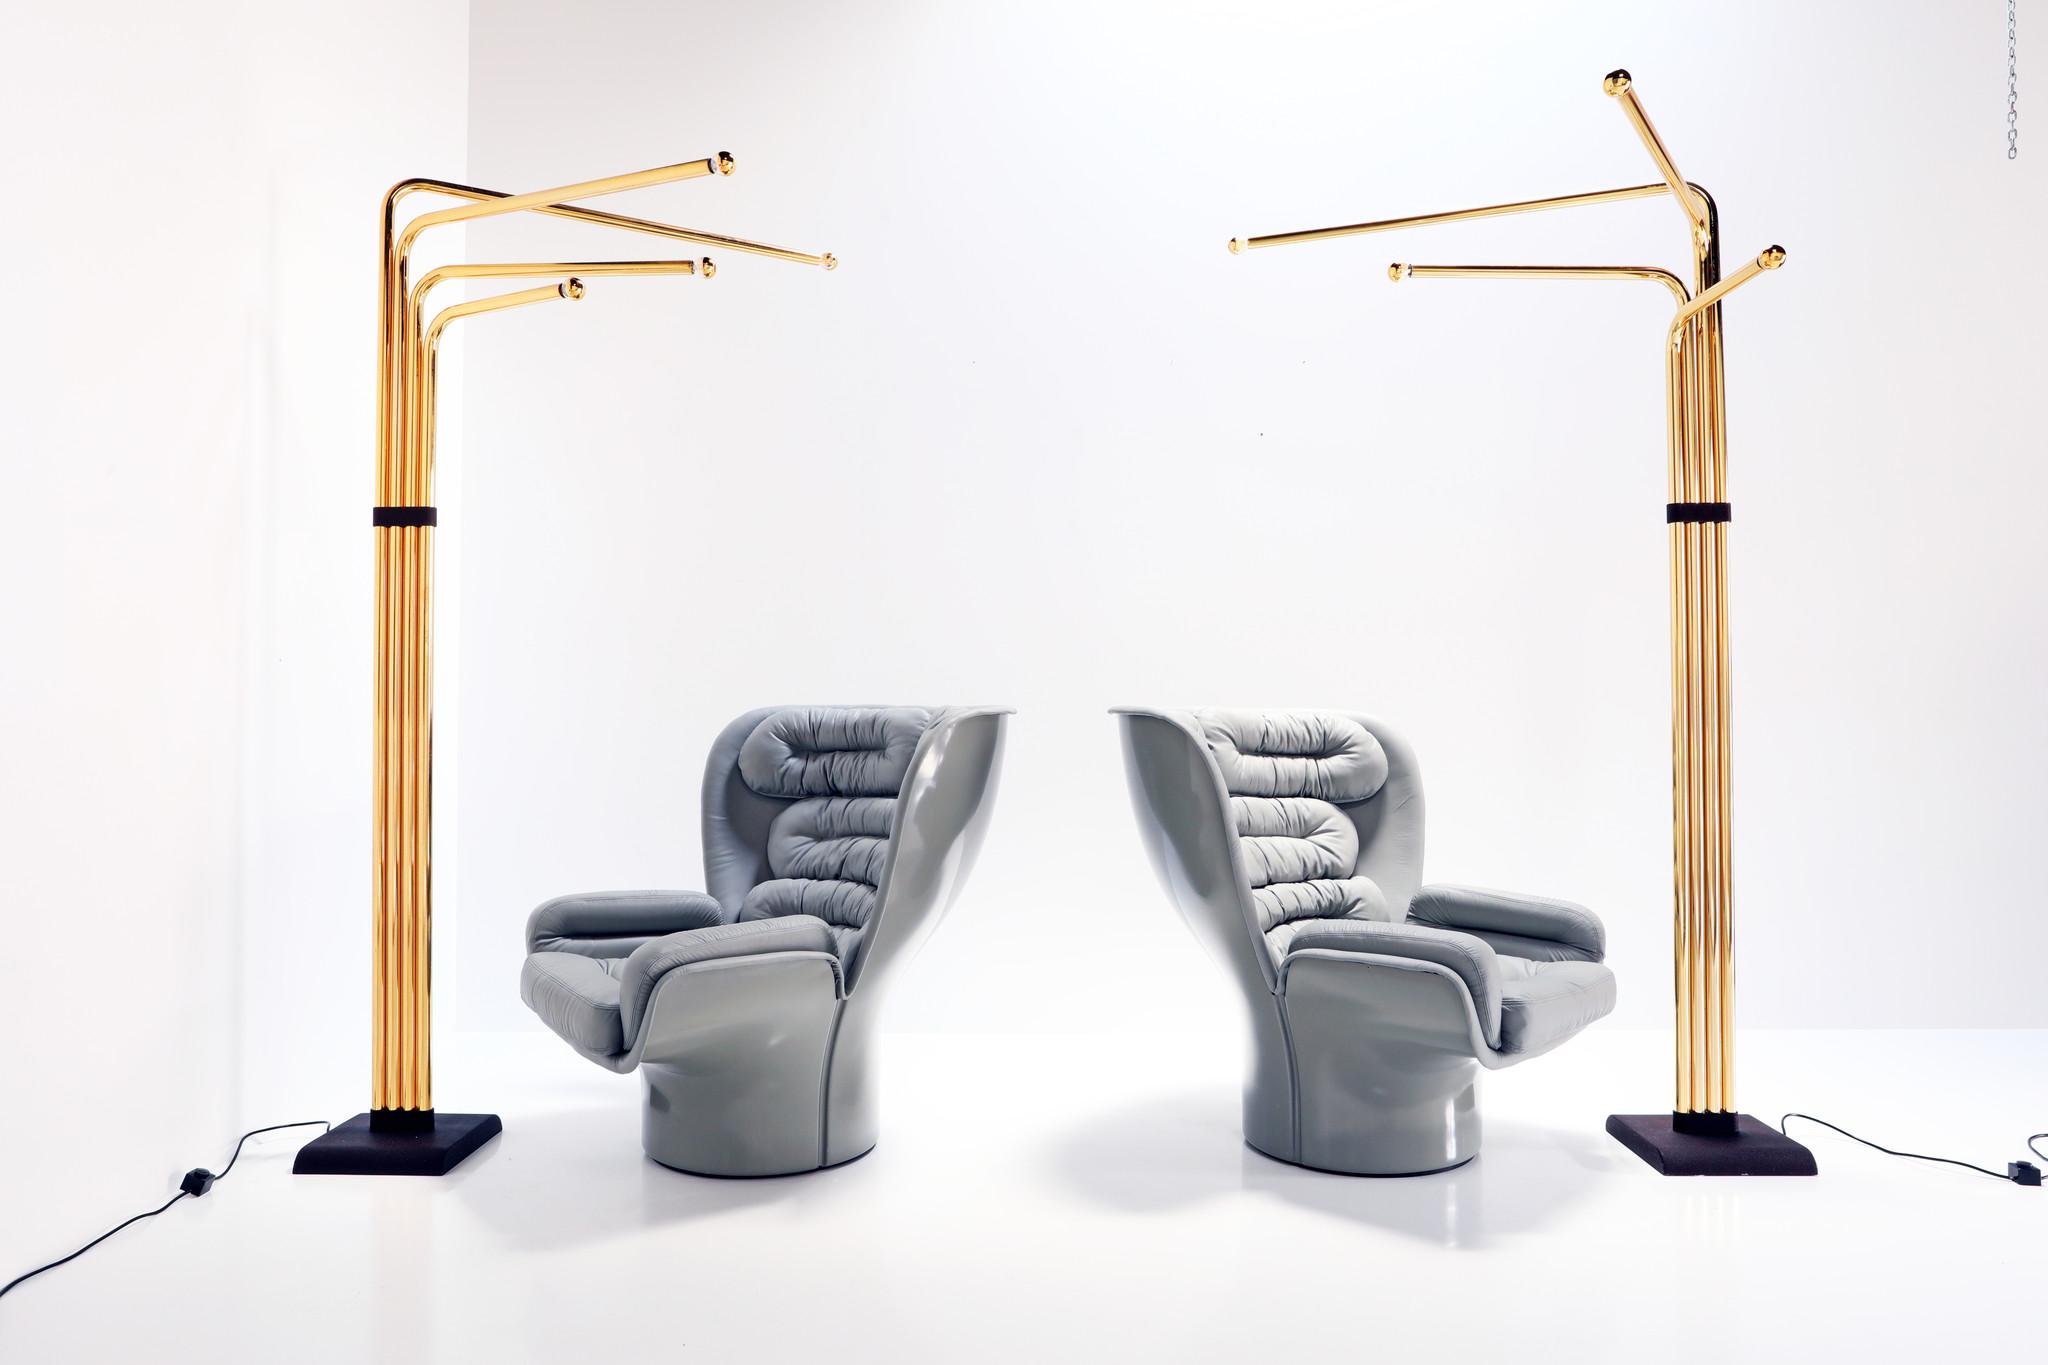 Italian floor lamp designed by Goffredo Reggiani, 1974